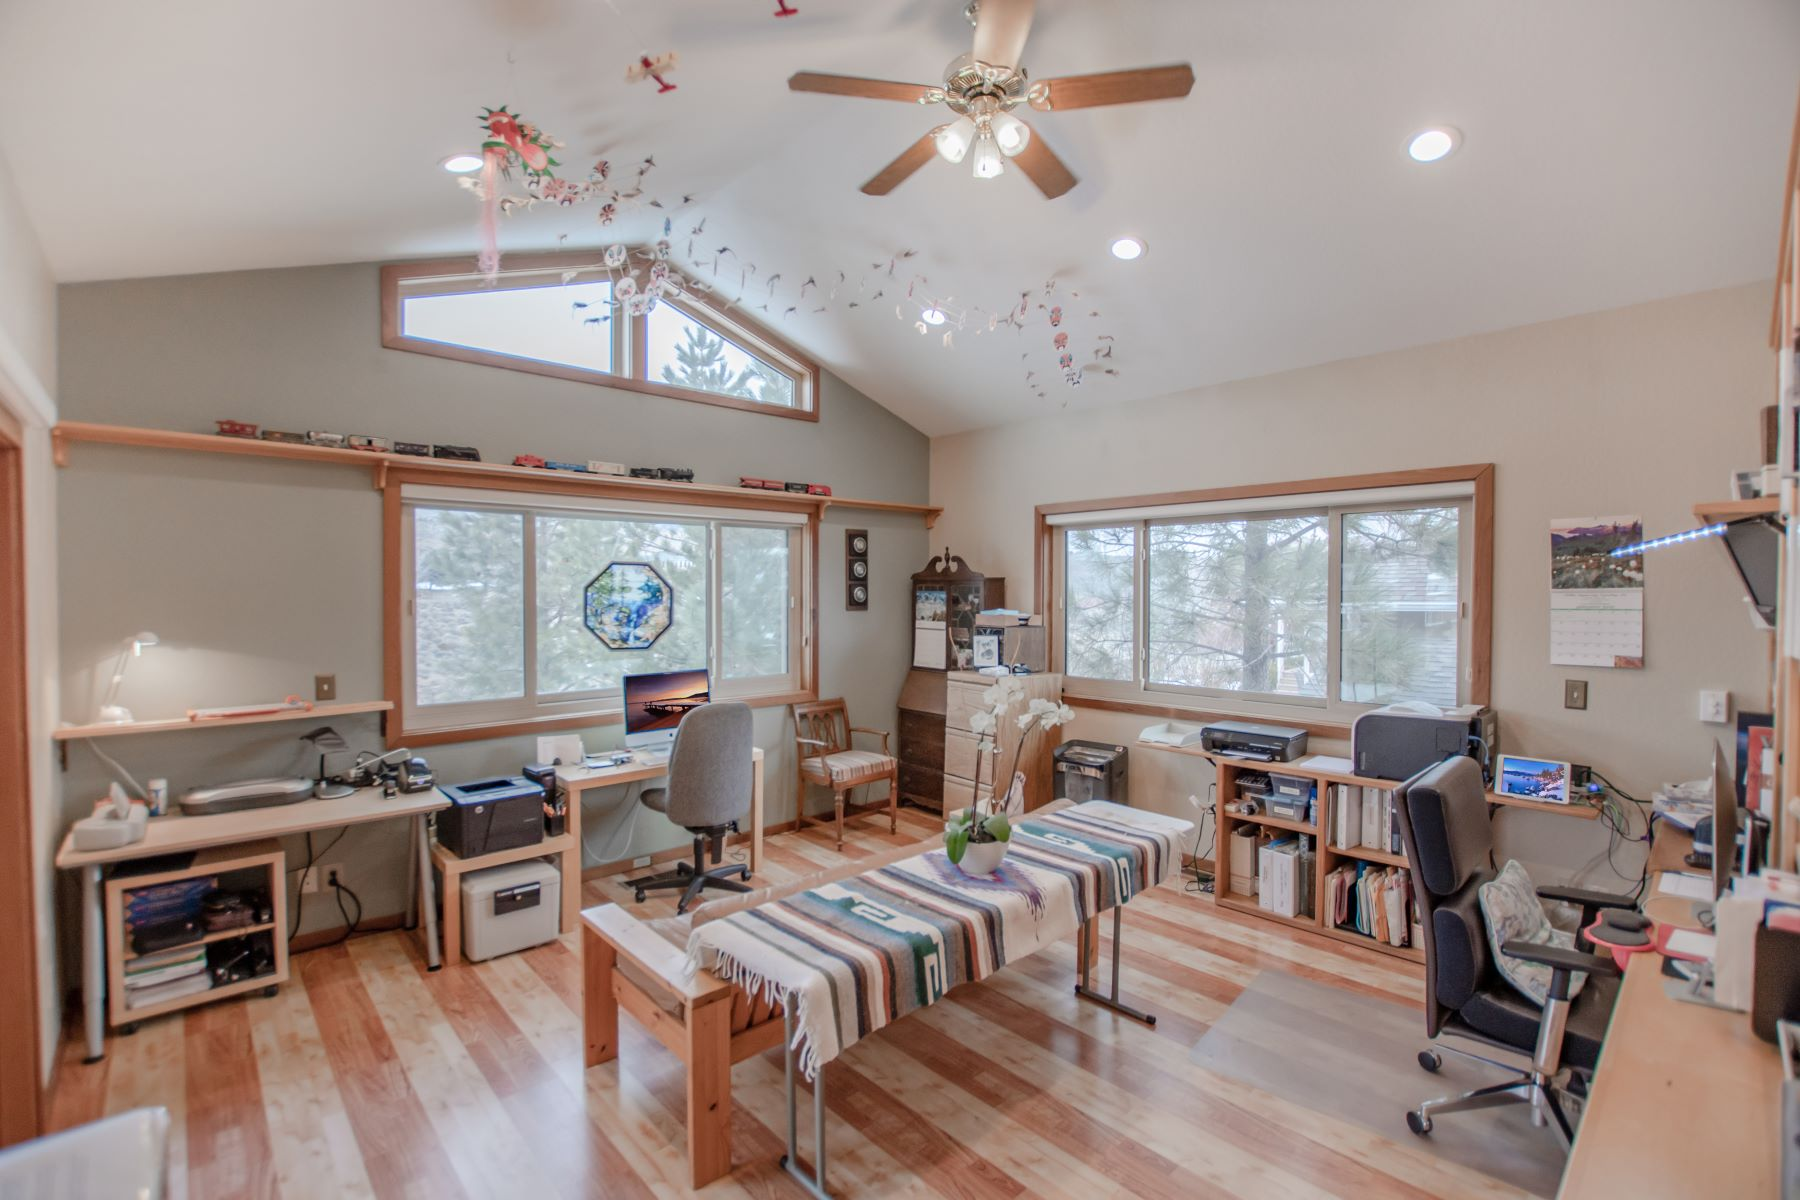 Additional photo for property listing at 295 Mogul Mountain Drive, Reno, Nevada 295 Mogul Mountain Drive Reno, Nevada 89523 United States